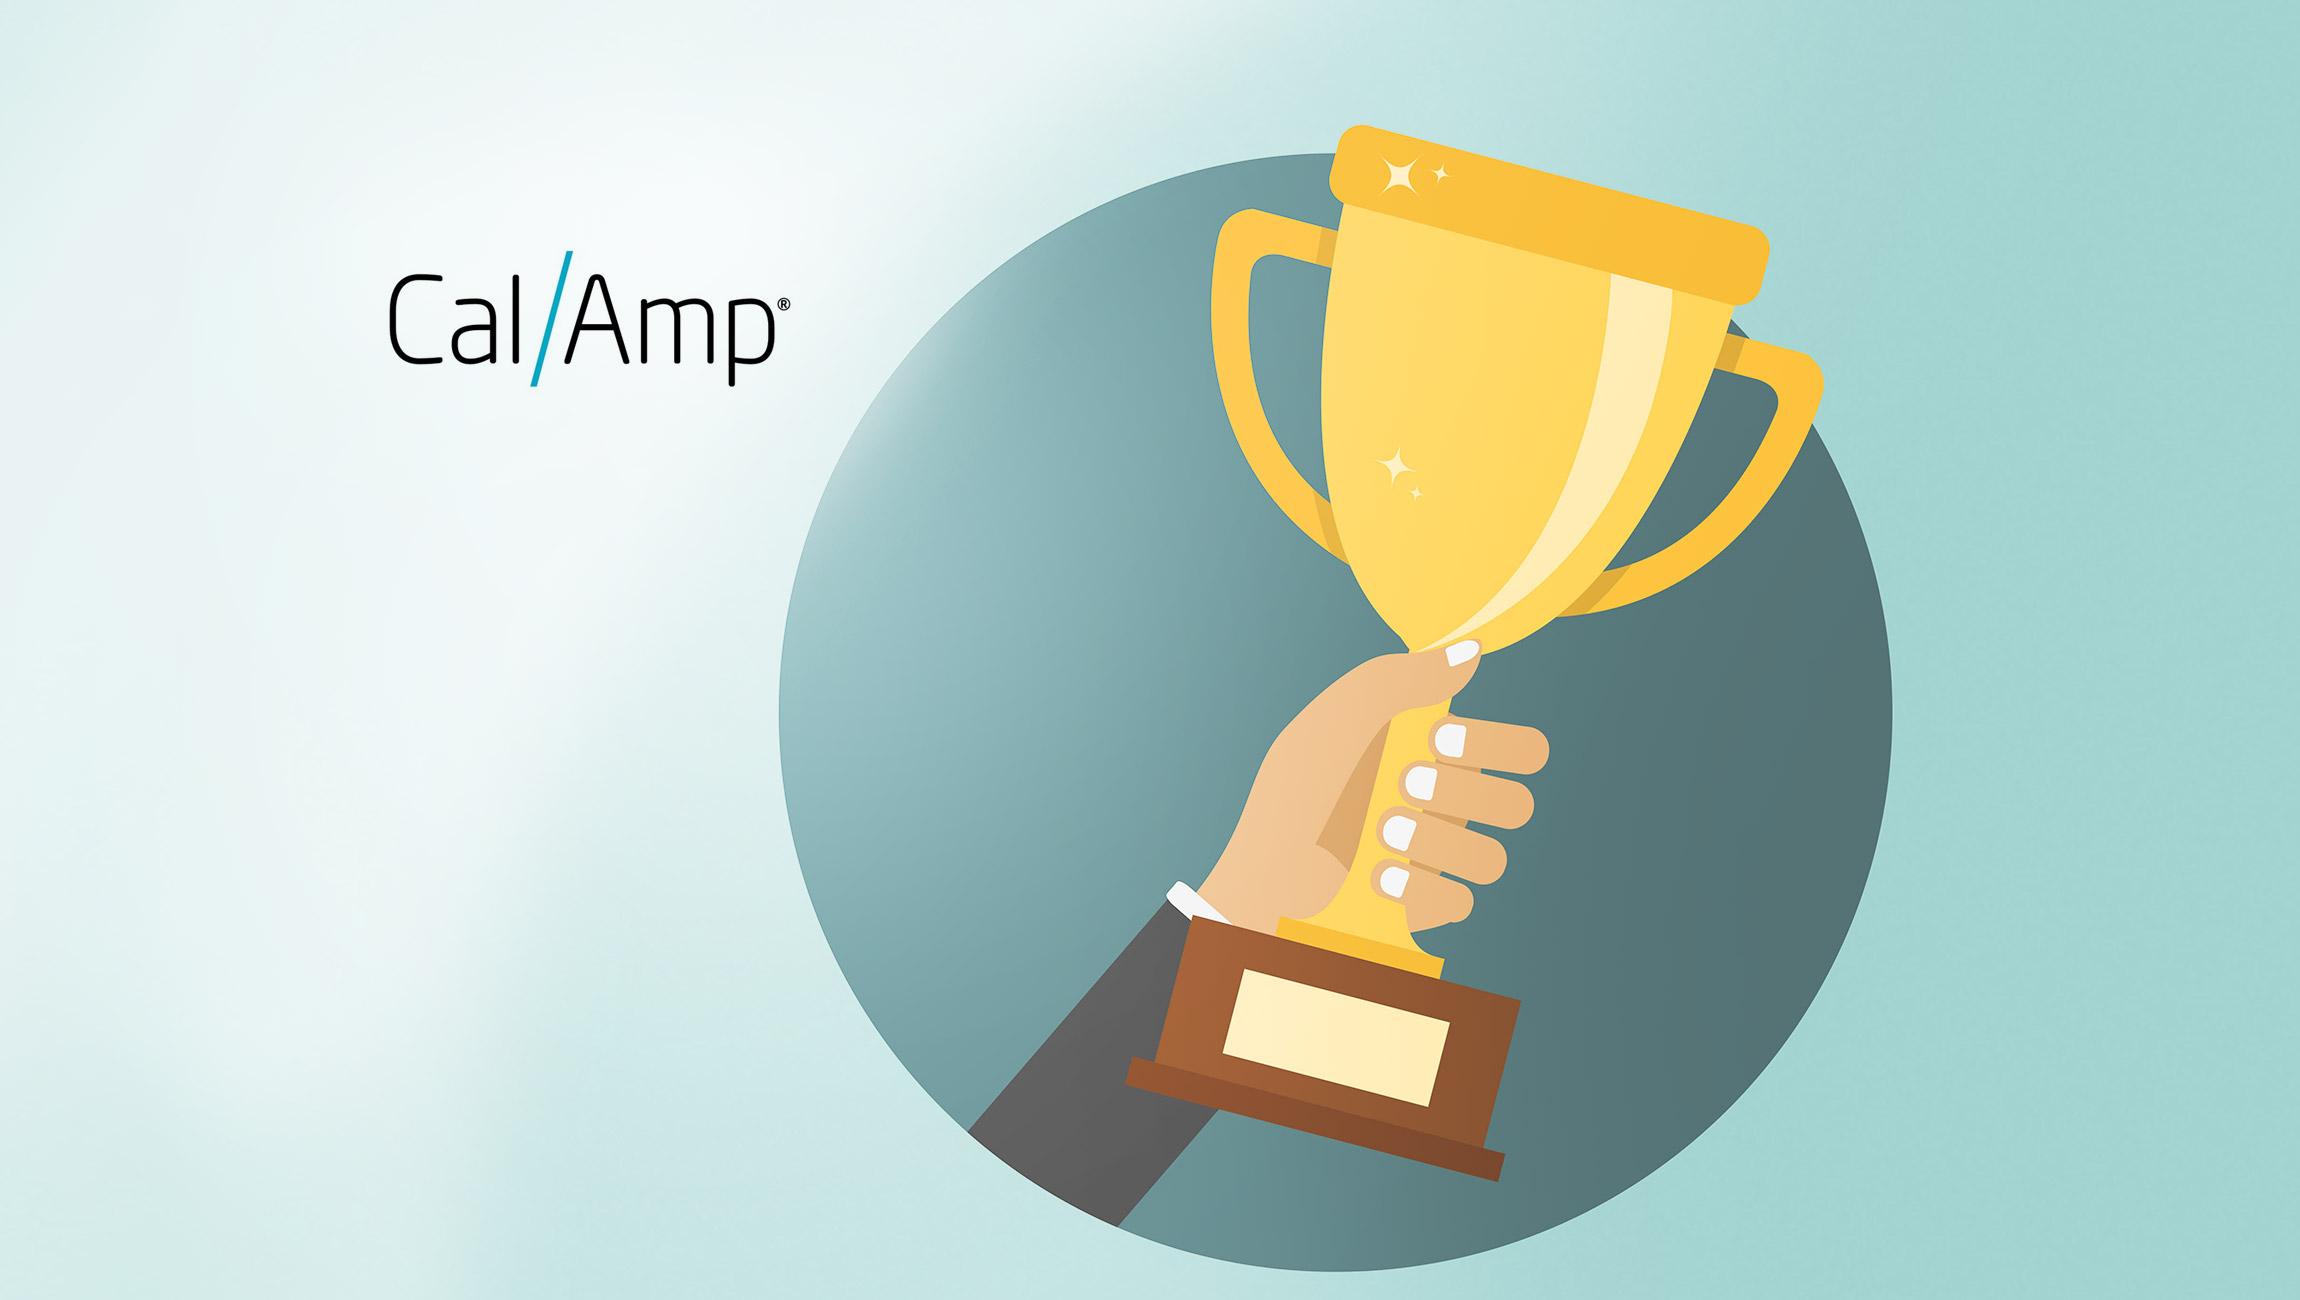 CalAmp Awarded 2020 OCTANe High Tech Award for Best Consumer Technology Innovation